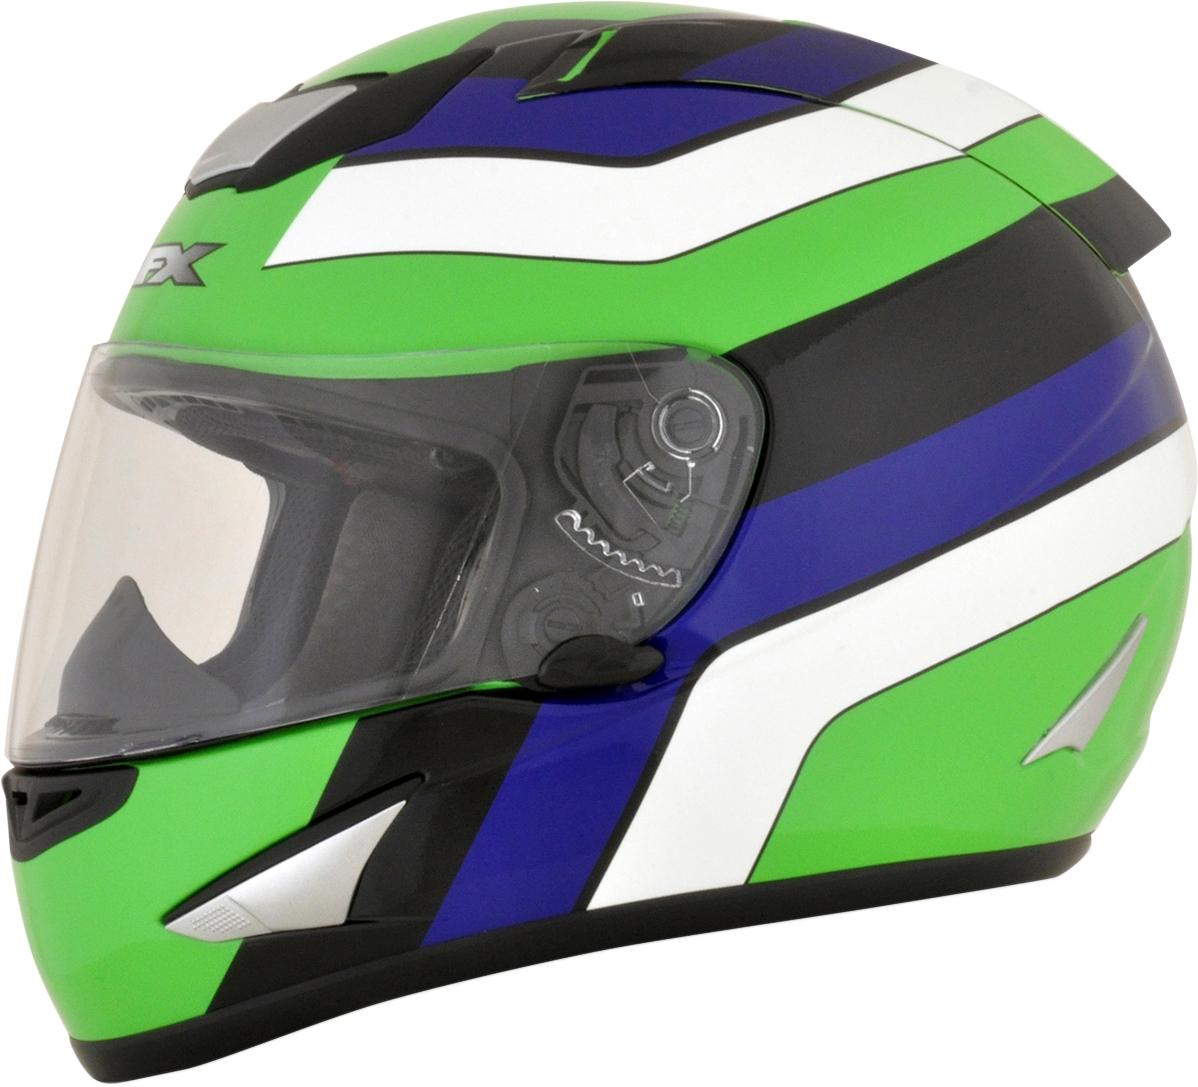 FX95 Full-Face Helmet Vintage Kawasaki Graphics